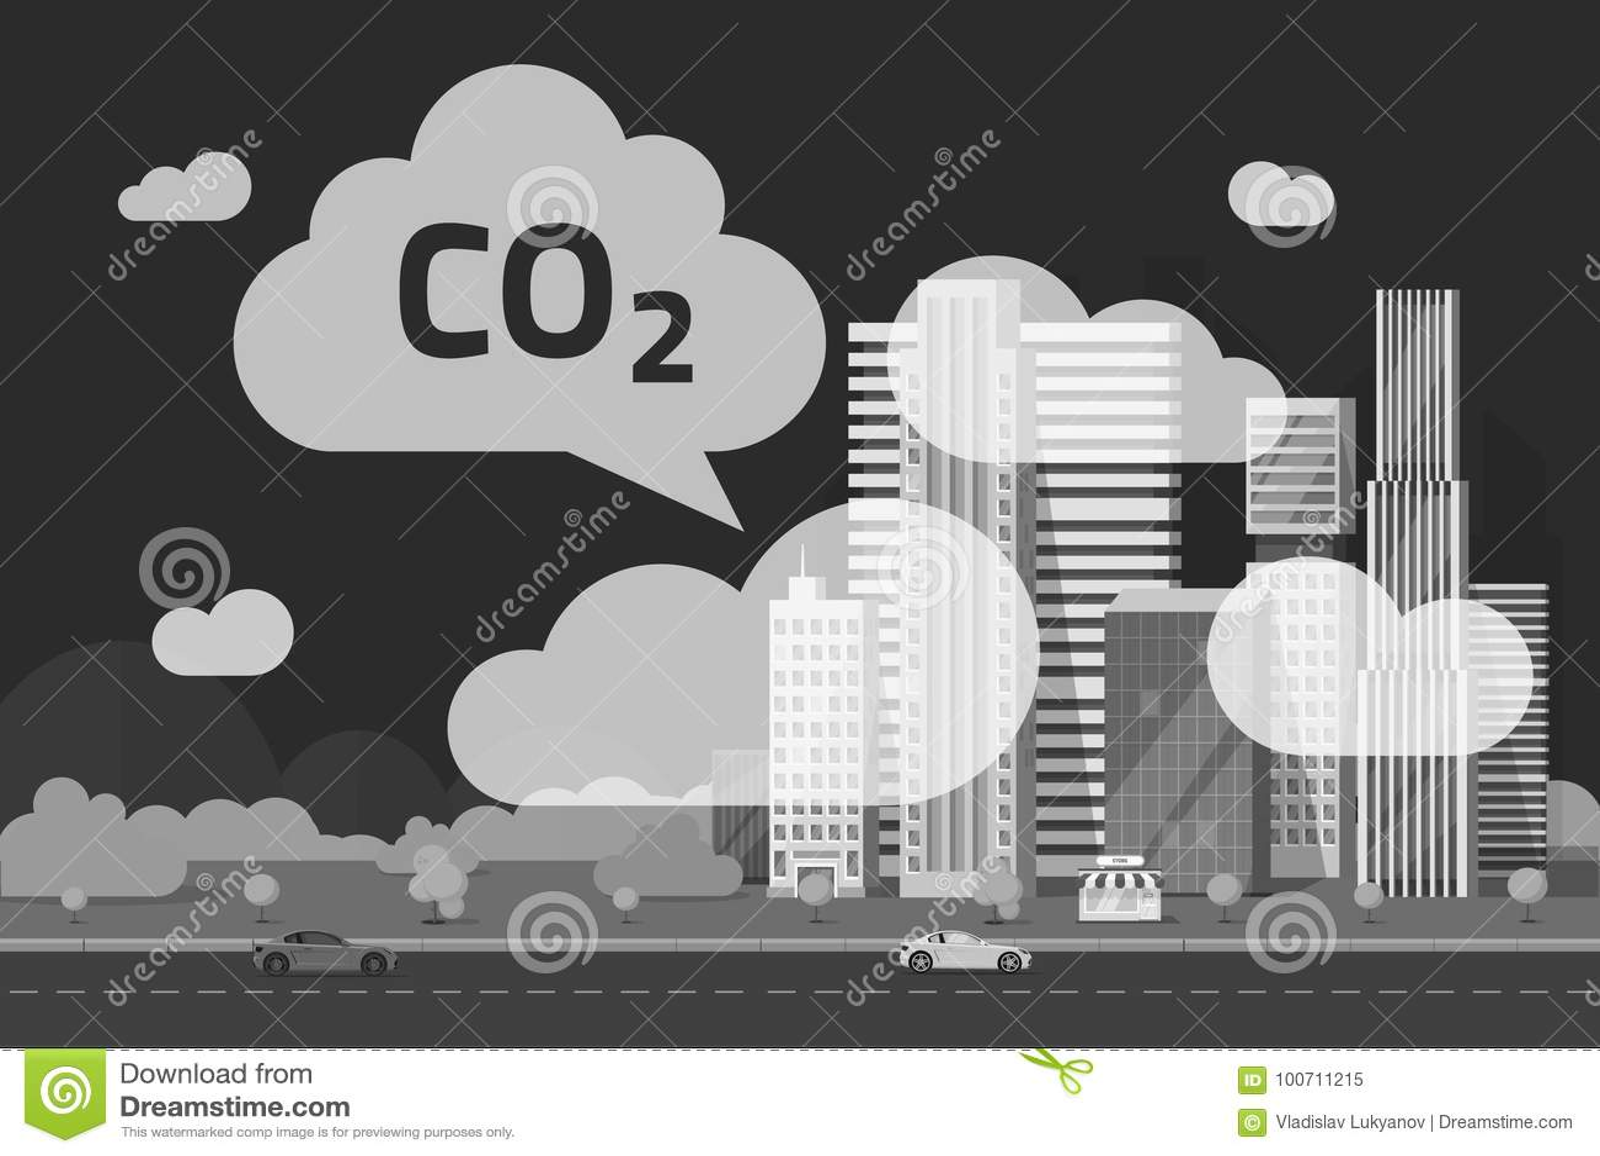 CO2 emissions by big city vector illustration, flat cartoon urban scene or carbon dioxide emission or pollution clouds